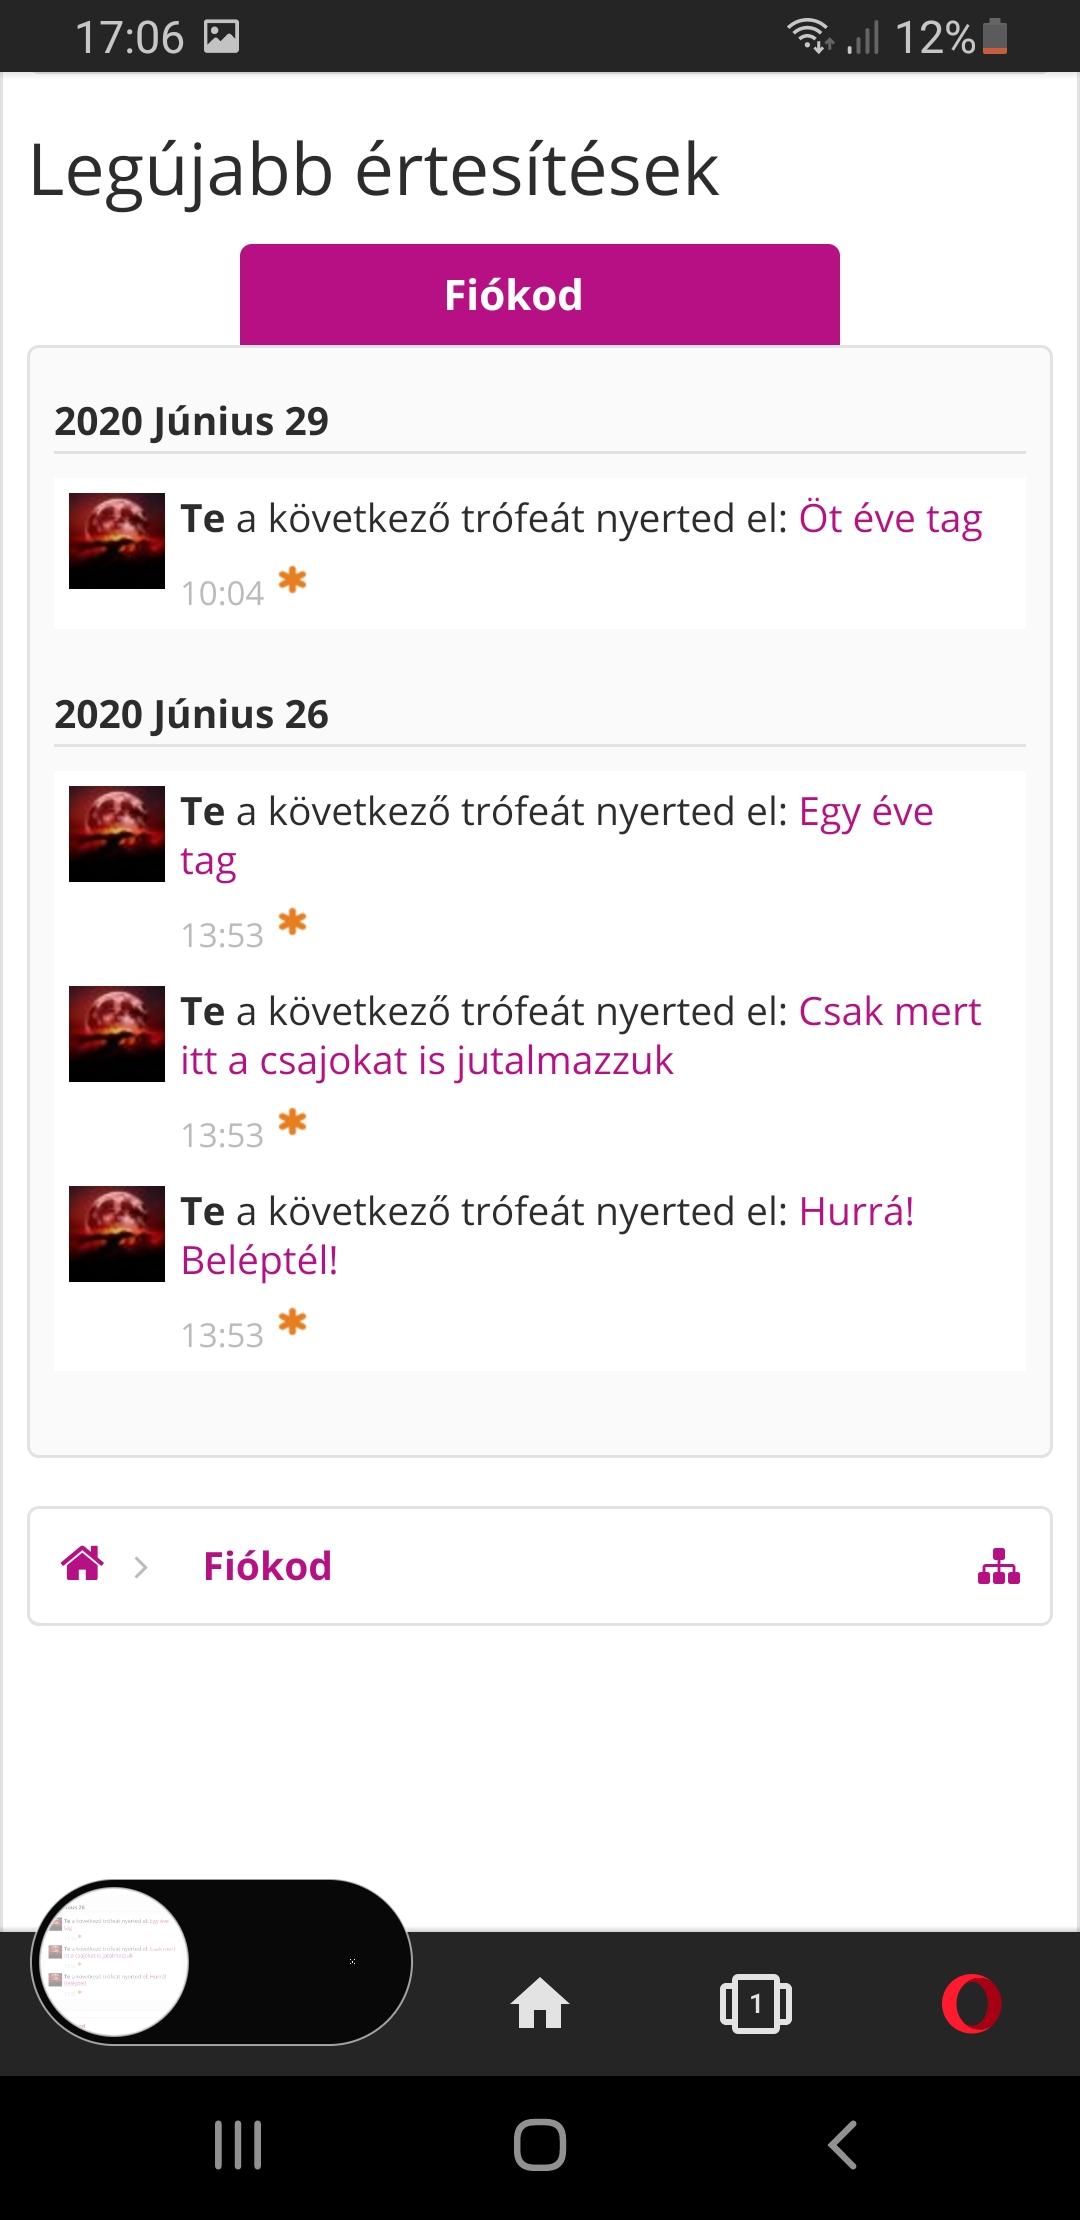 Screenshot_20200711-170613_Opera.jpg